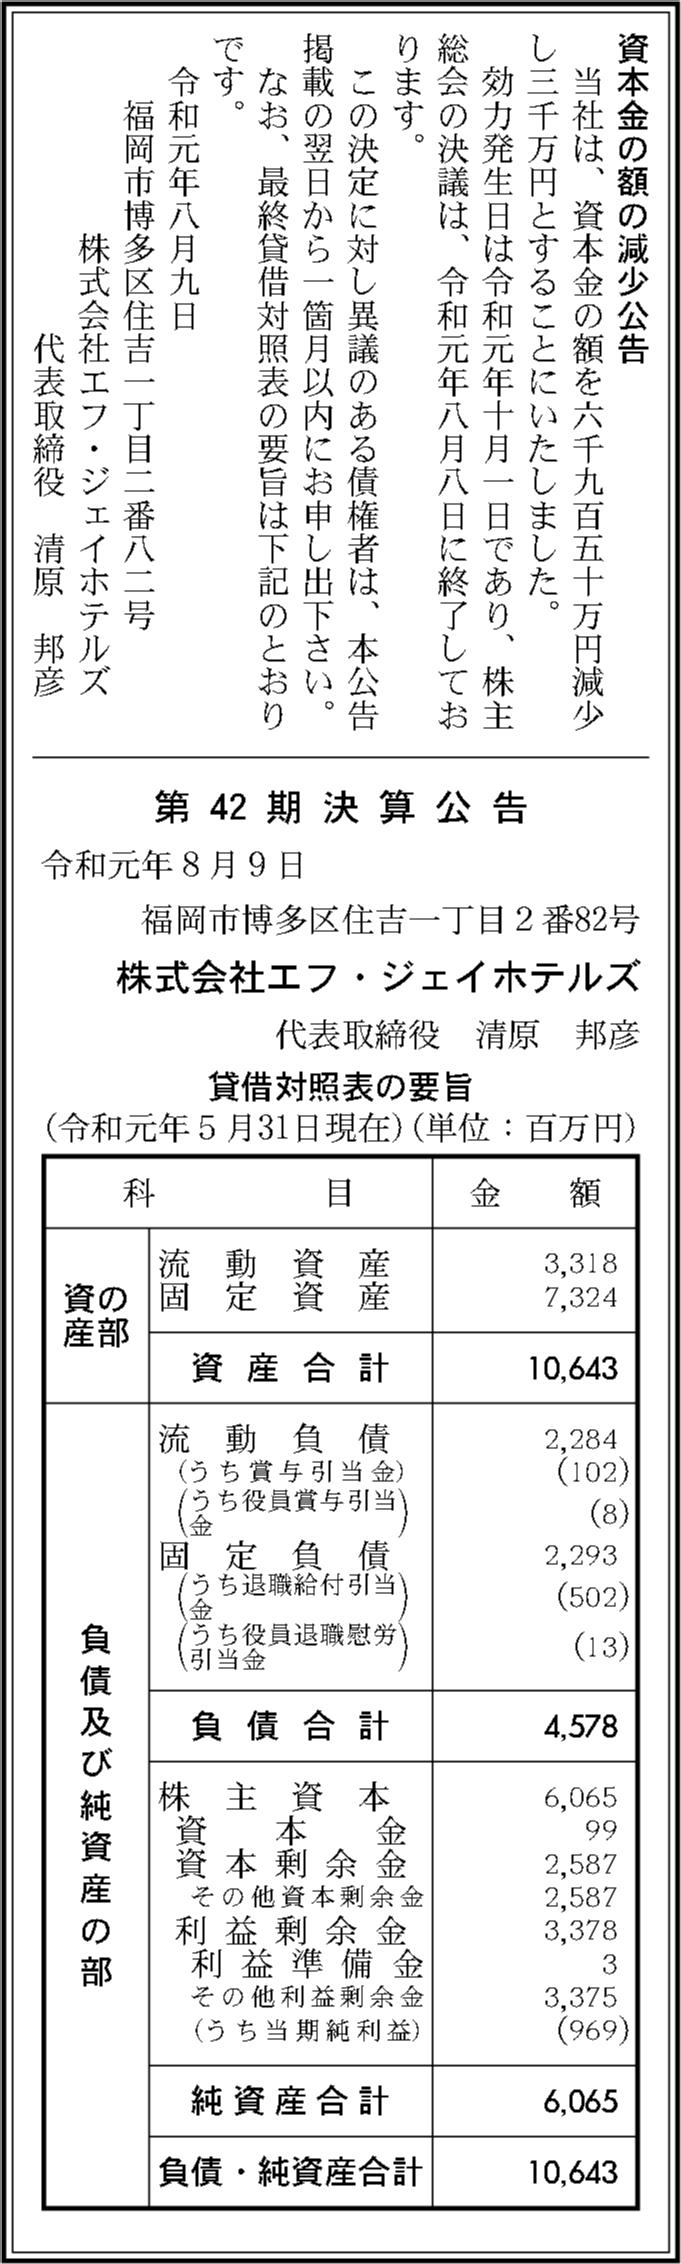 0093 27104951c99cbd4f73f6c435cb8288efa9905354b0222018b41d48e49b633fc52c084ebd7c6fe32273023d54f233ff1824a11dd82113abb6b3c8a2f26fc7d0dd 03